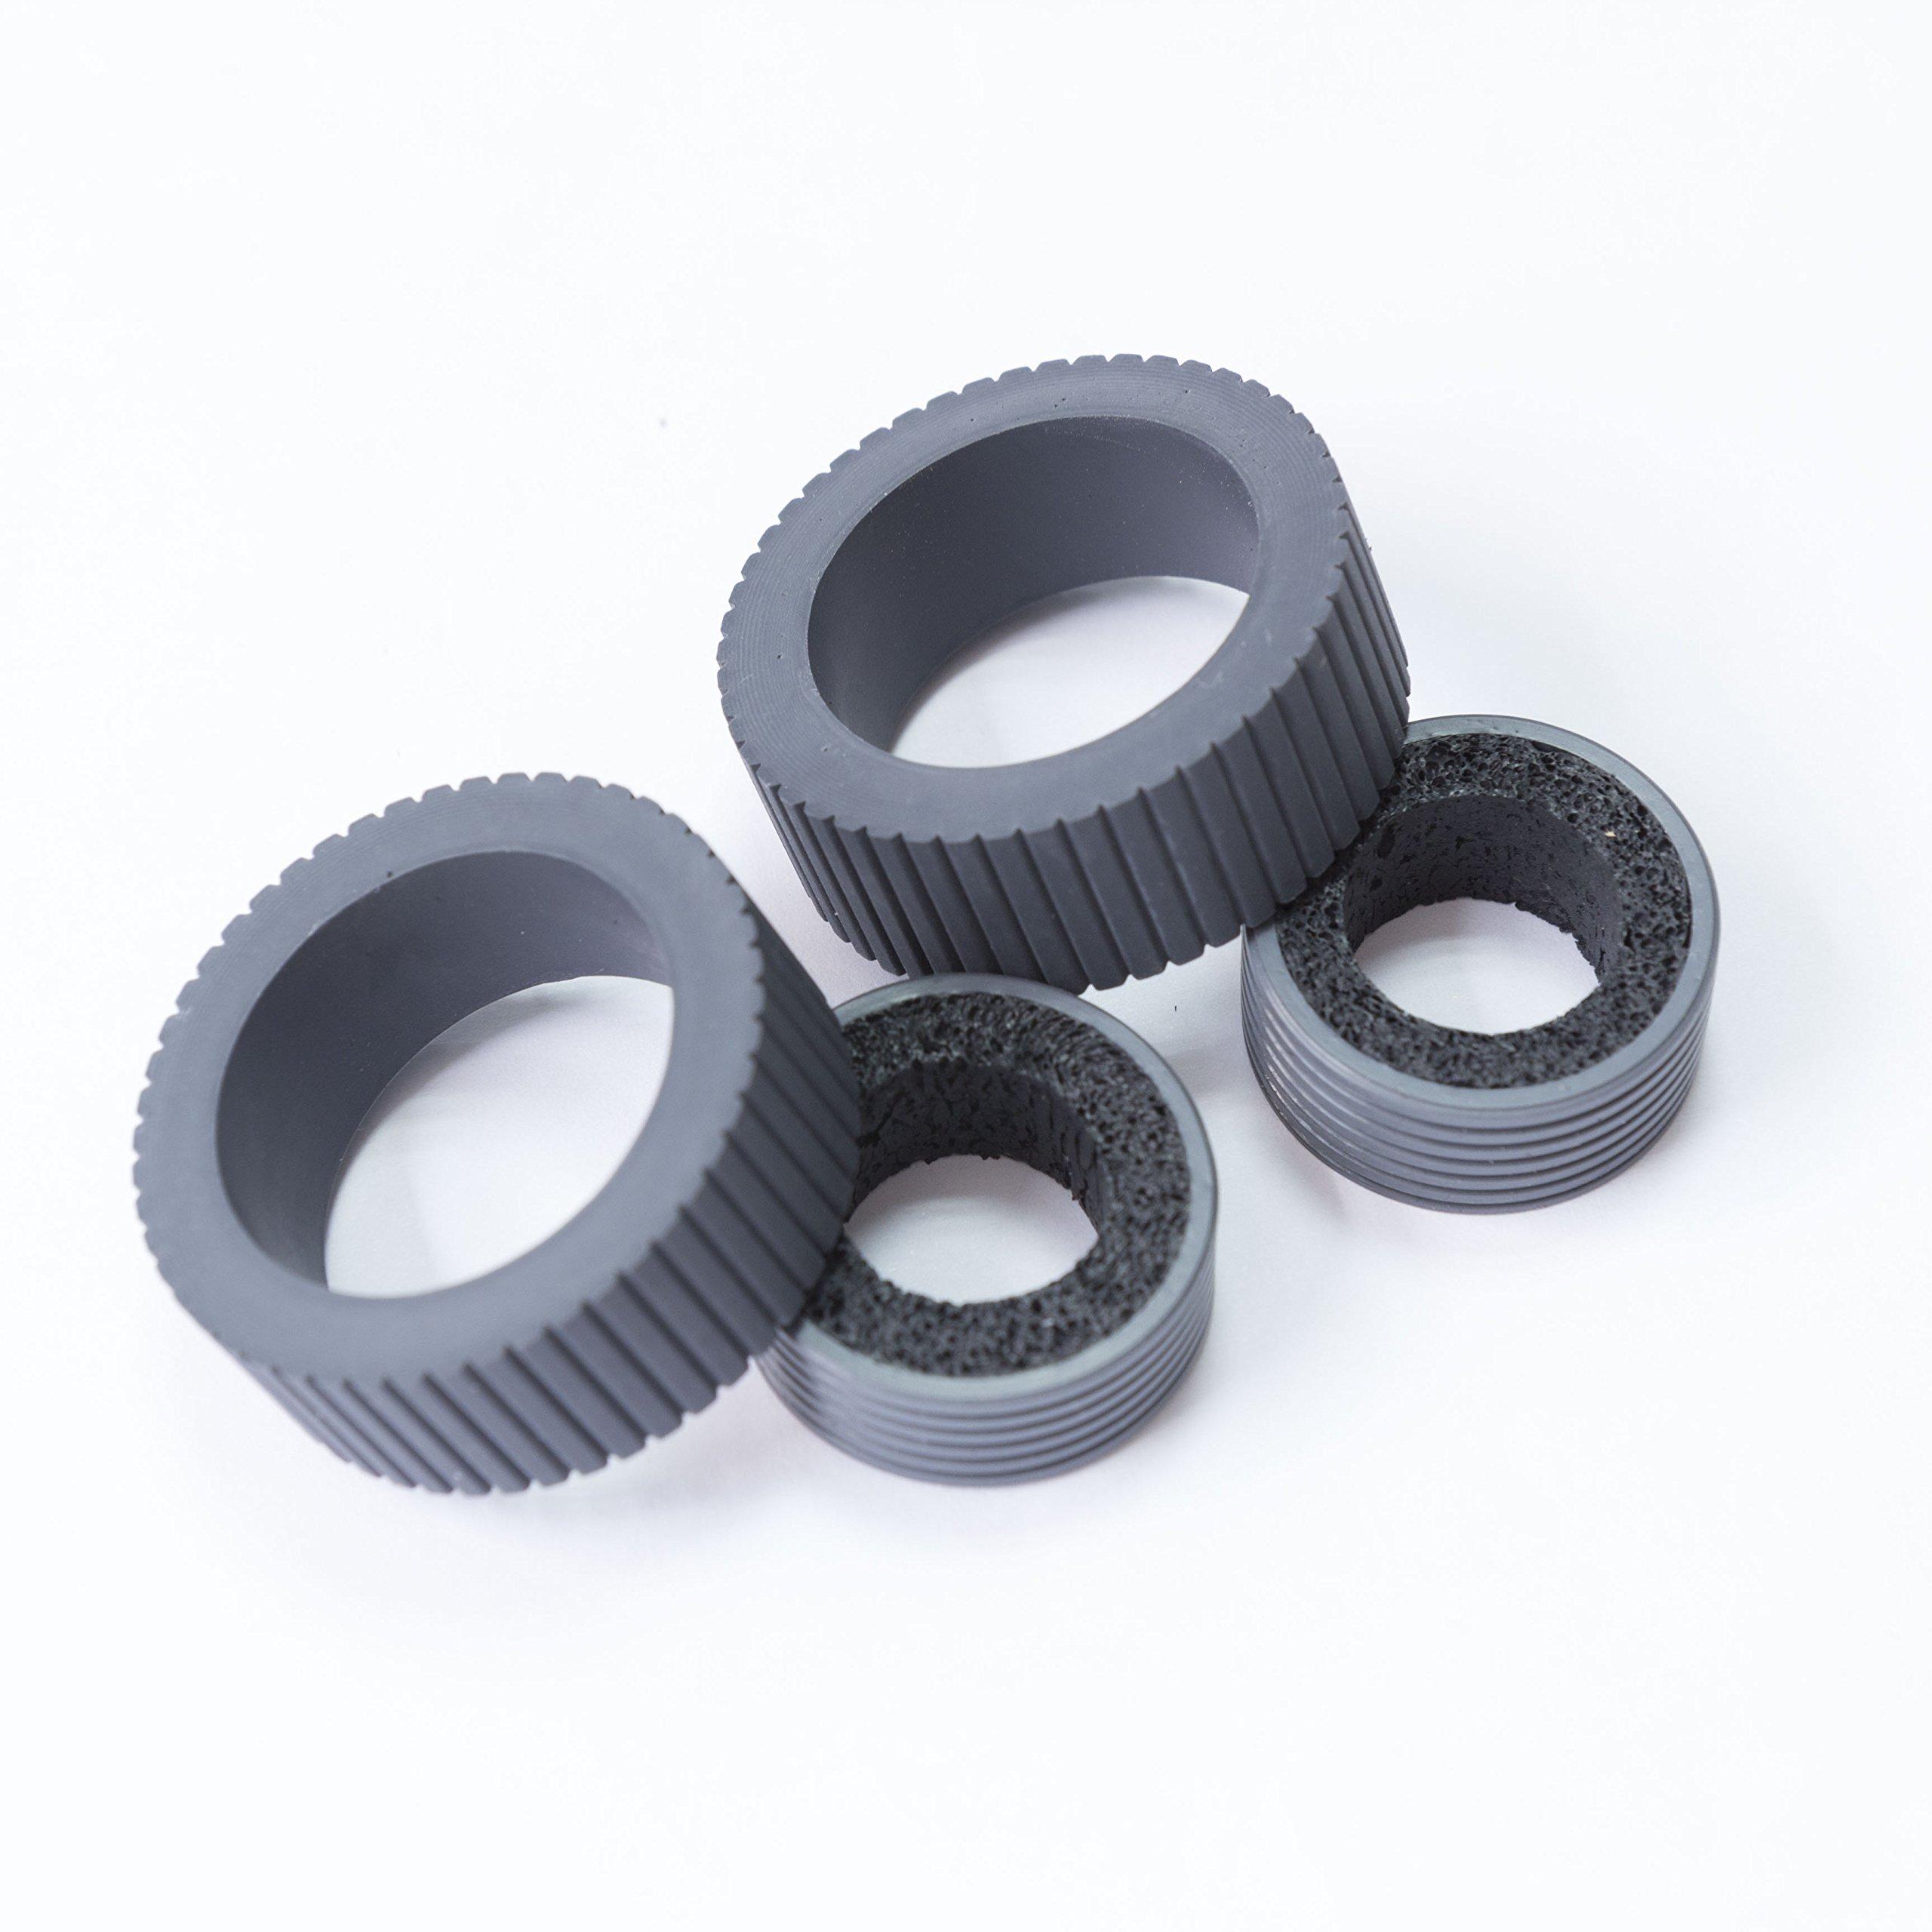 YANZEO PA03540-0001 PA03540-0002 Scanner Brake and Pick Roller Tire Set For Fujistu 6130 FI-6140 FI-6240 FI-6130 FI-6230 FI-6130Z IX500